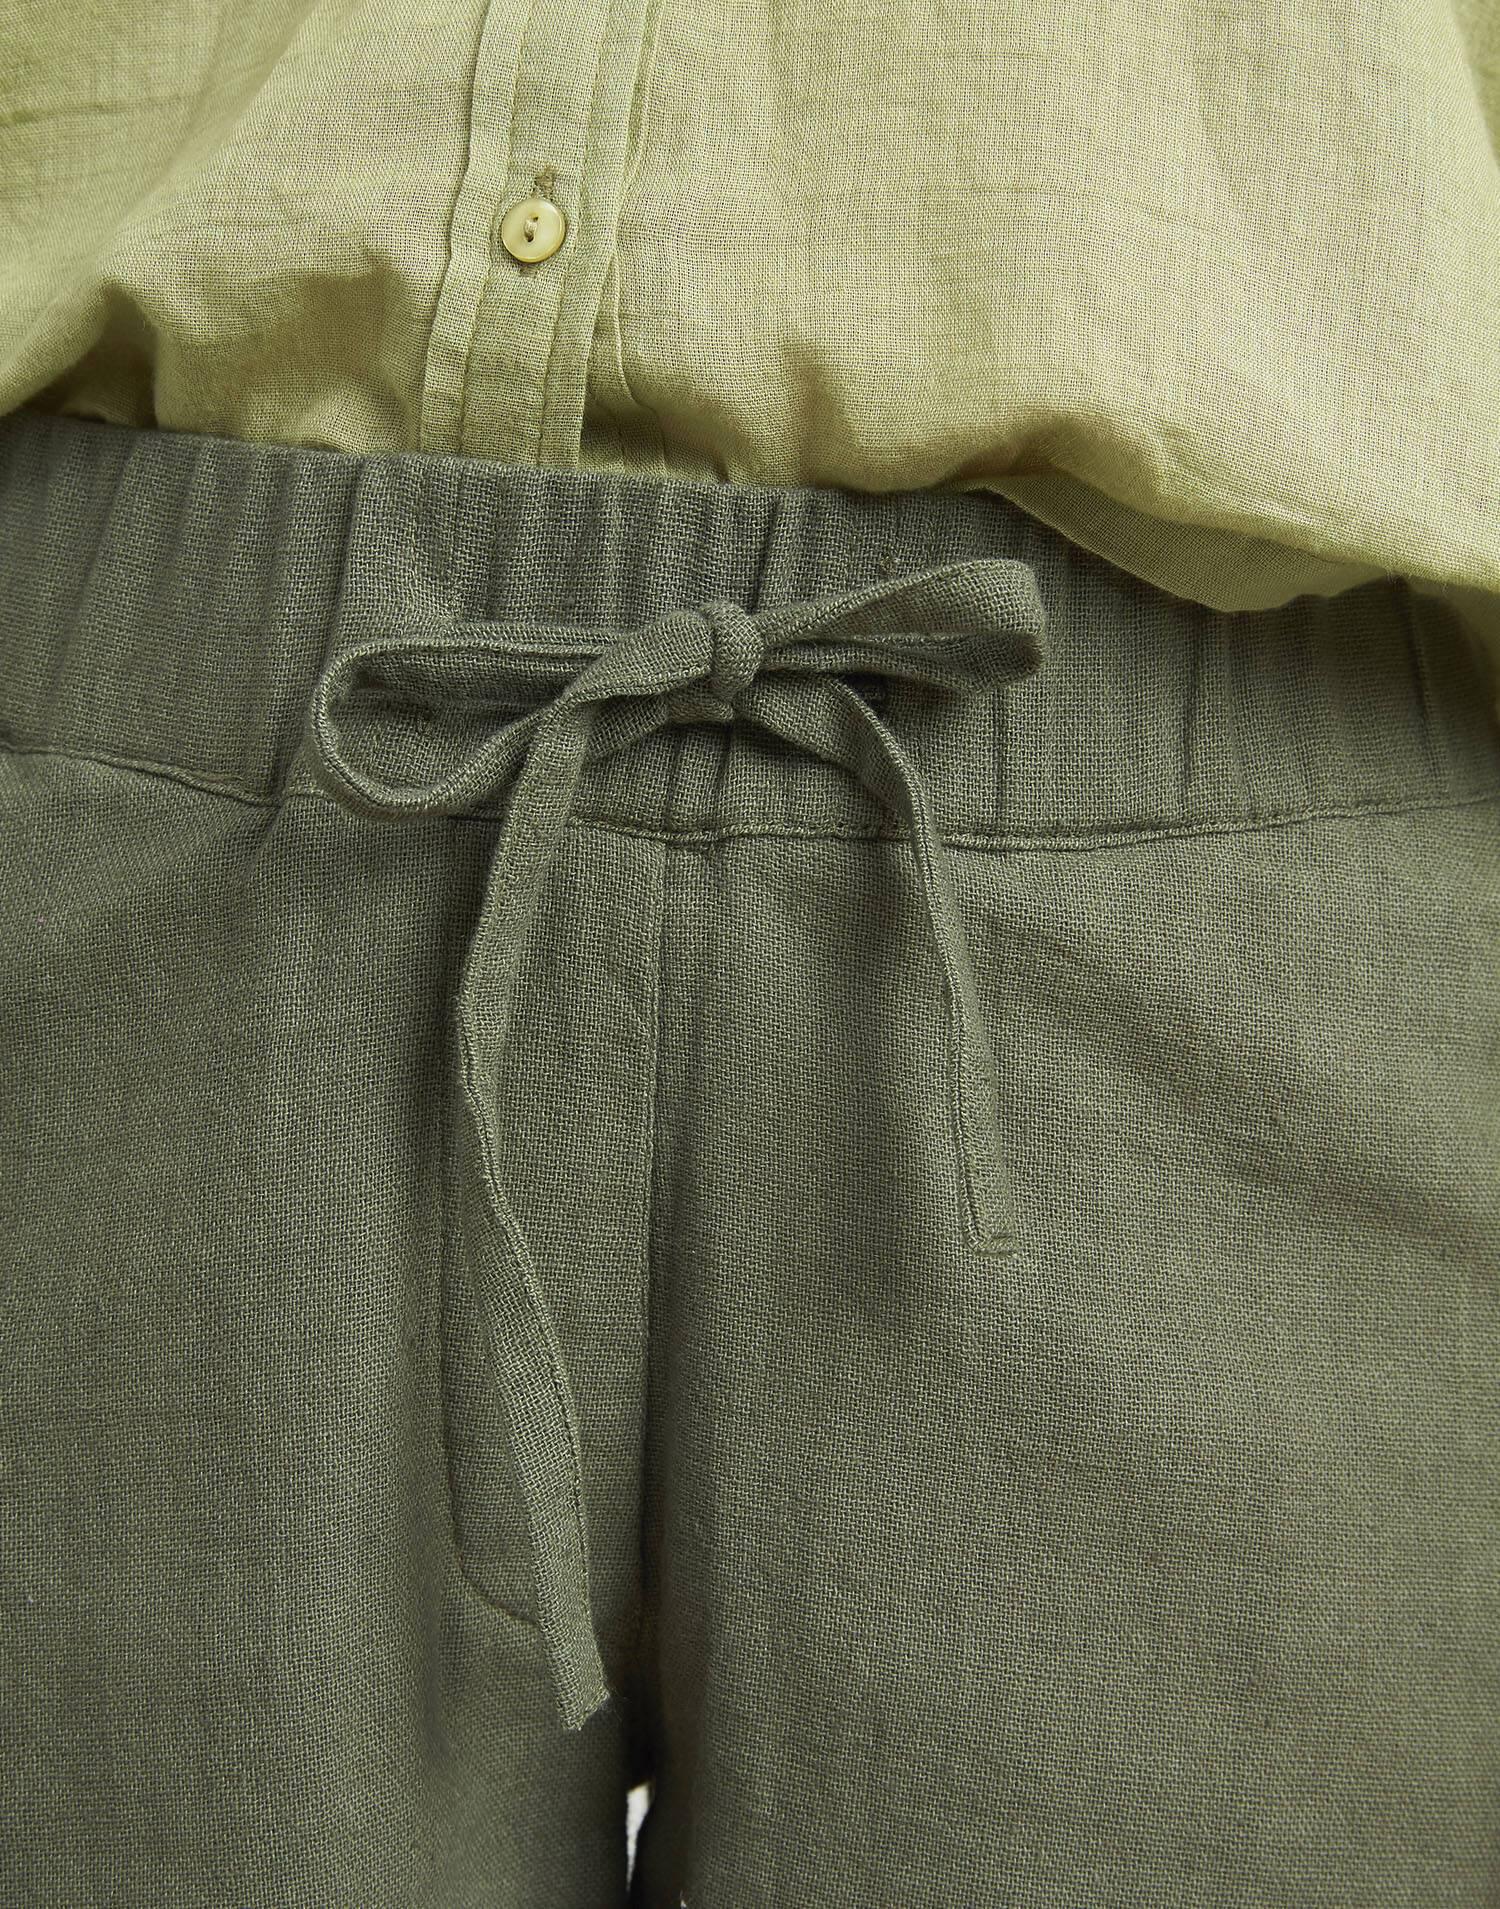 Short tejido rústico